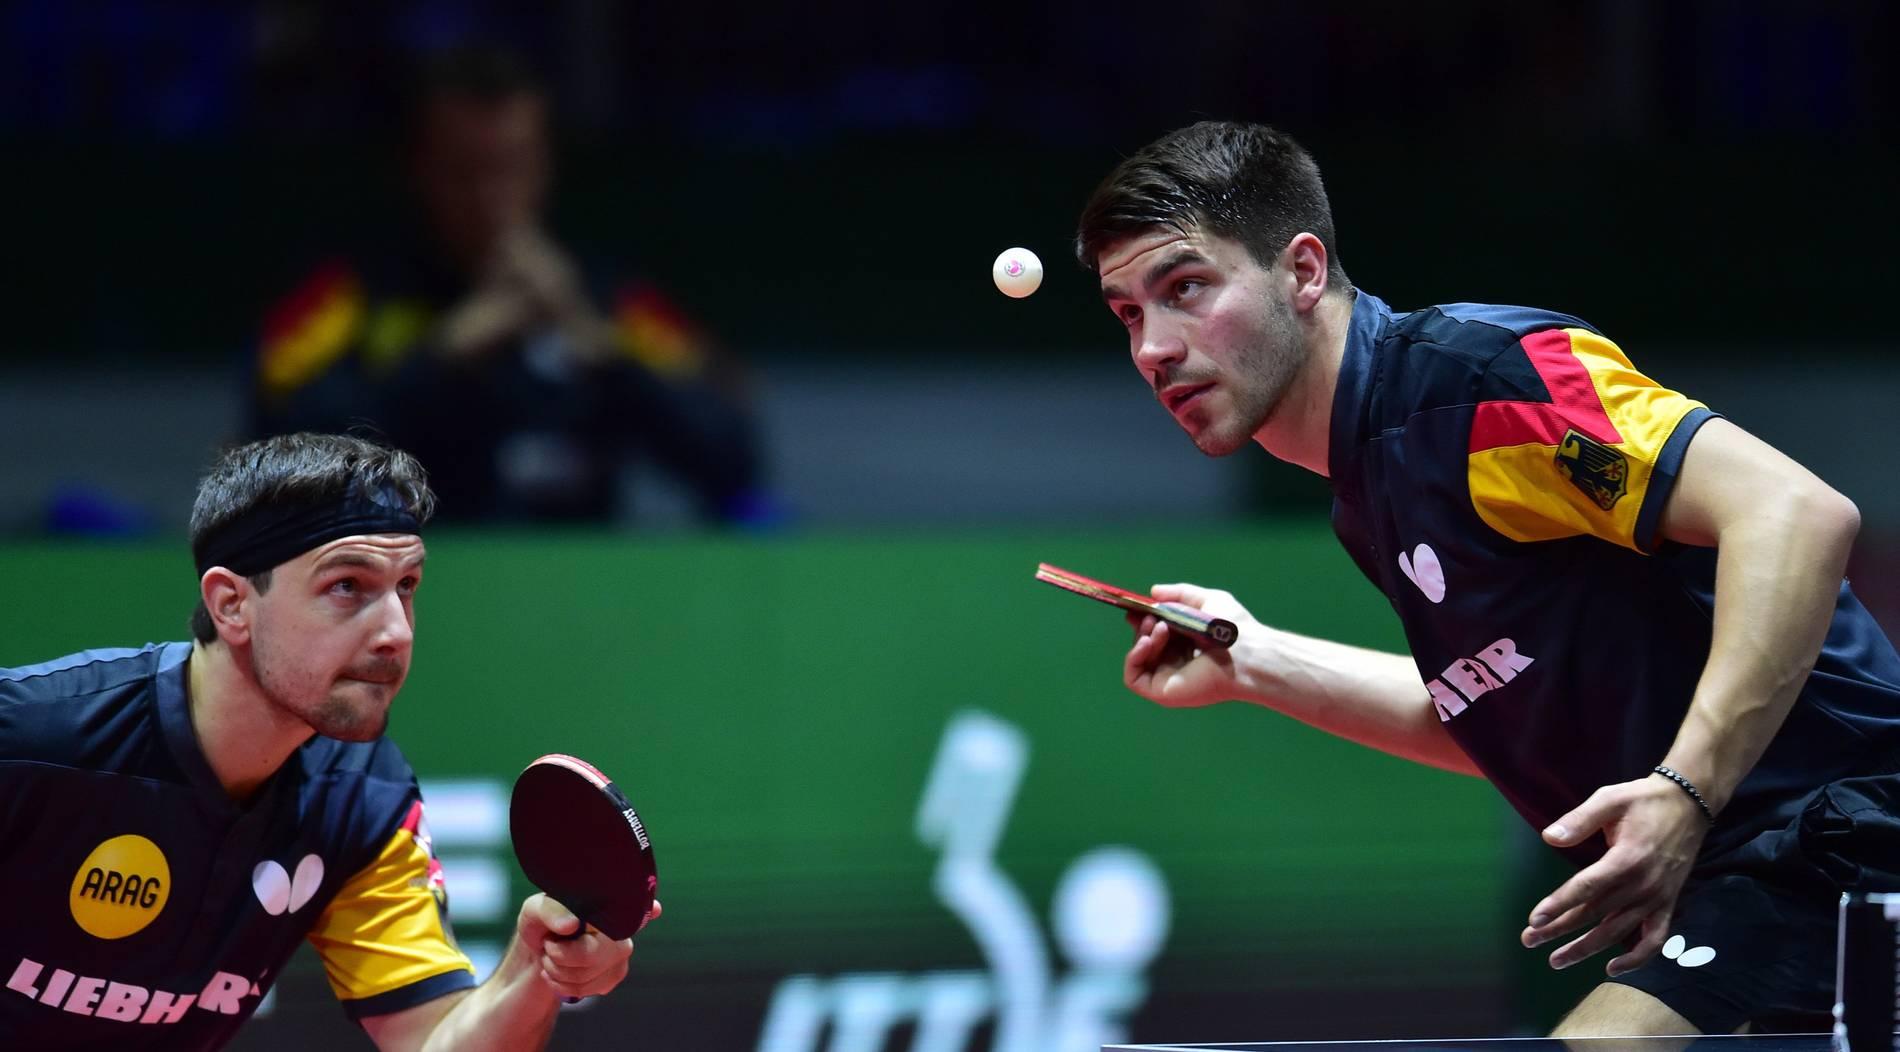 Timo Boll und Patrick Franziska greifen nach Doppel-Medaille